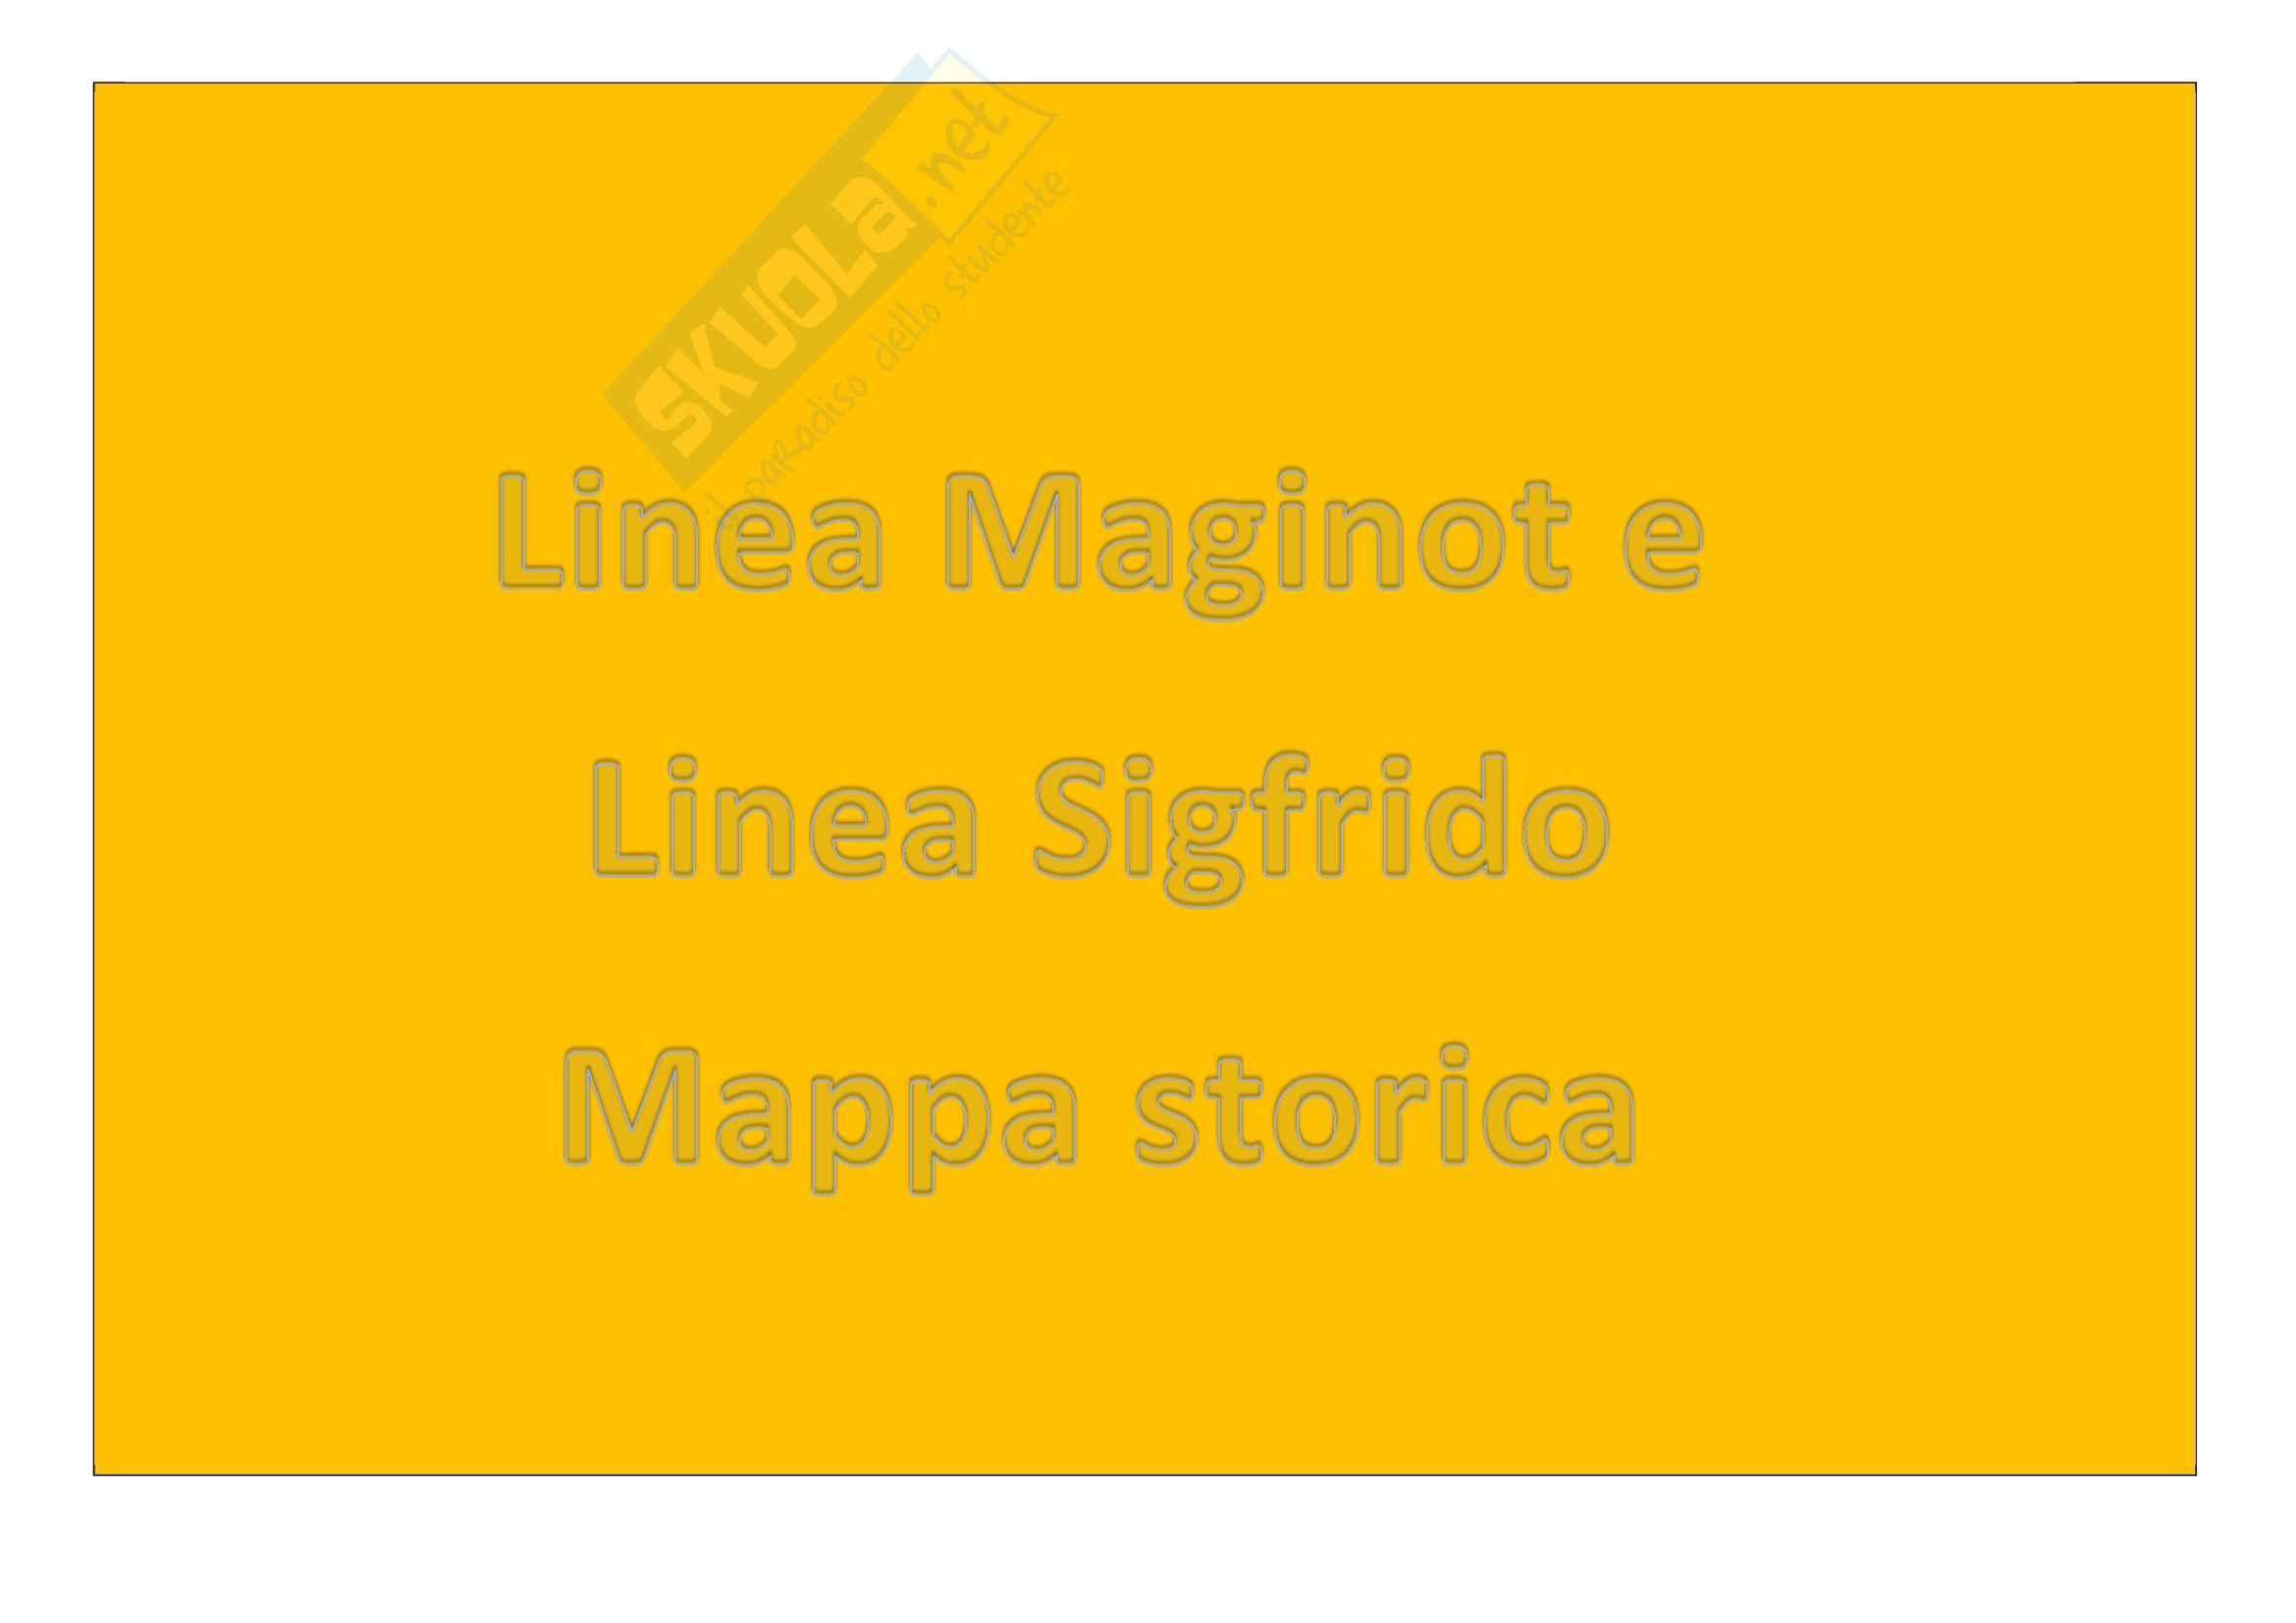 Seconda Guerra Mondiale - Linea Maginot e linea Sigfrido, mappa